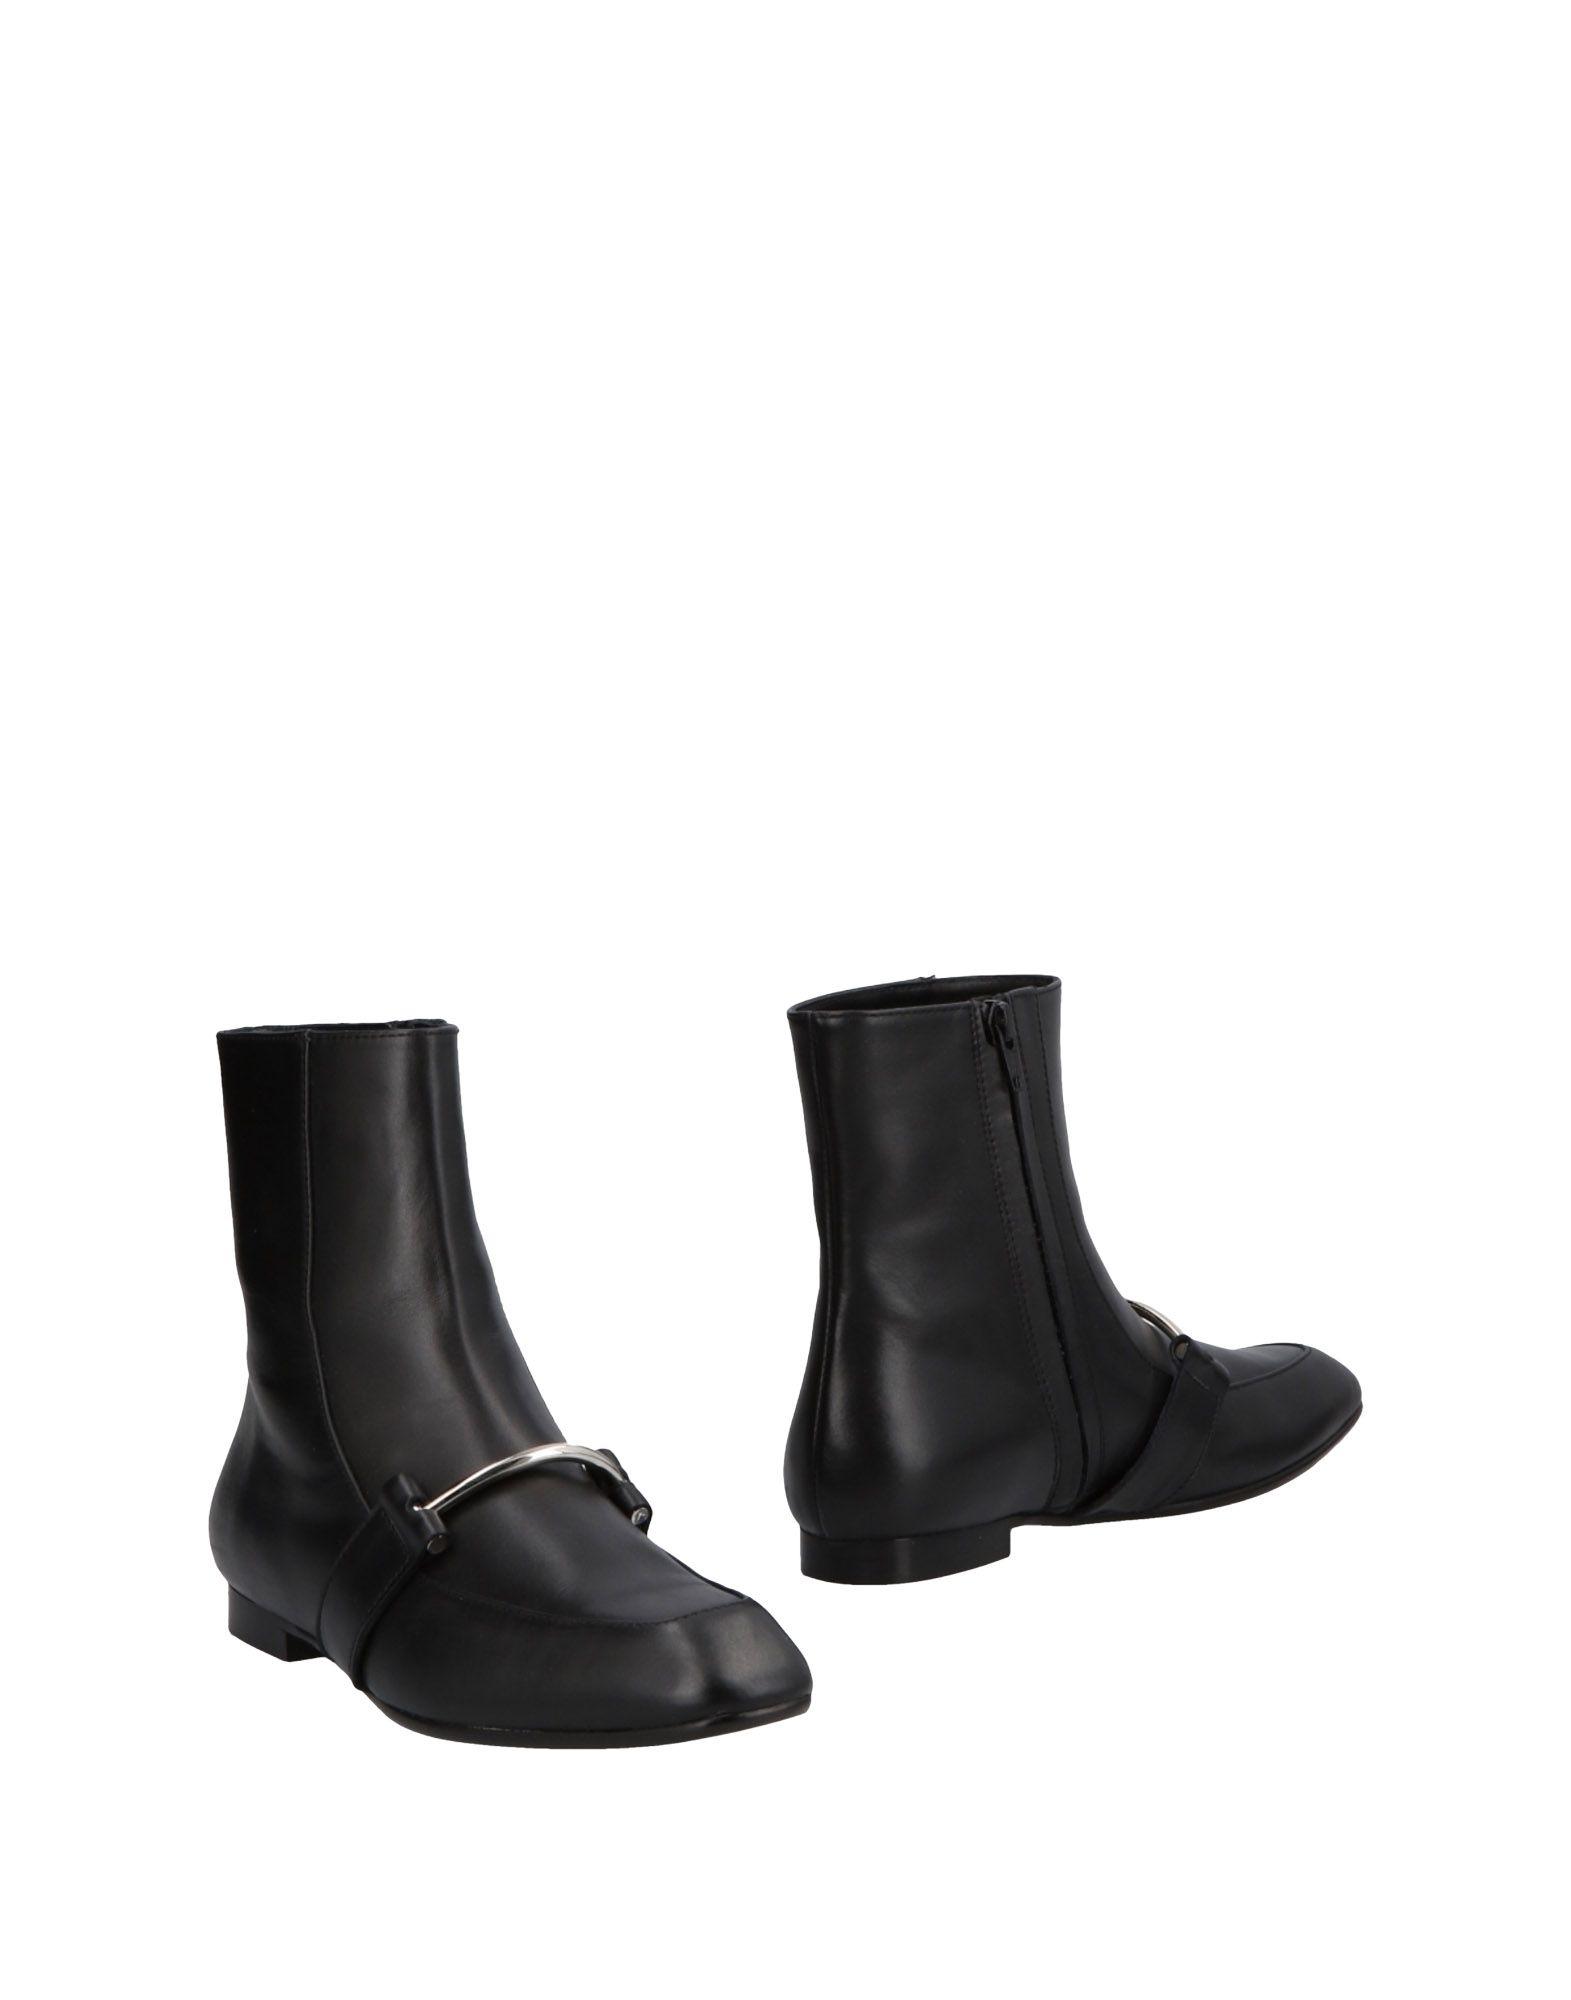 ANGELA CHIARA VENEZIA Ankle Boots in Black